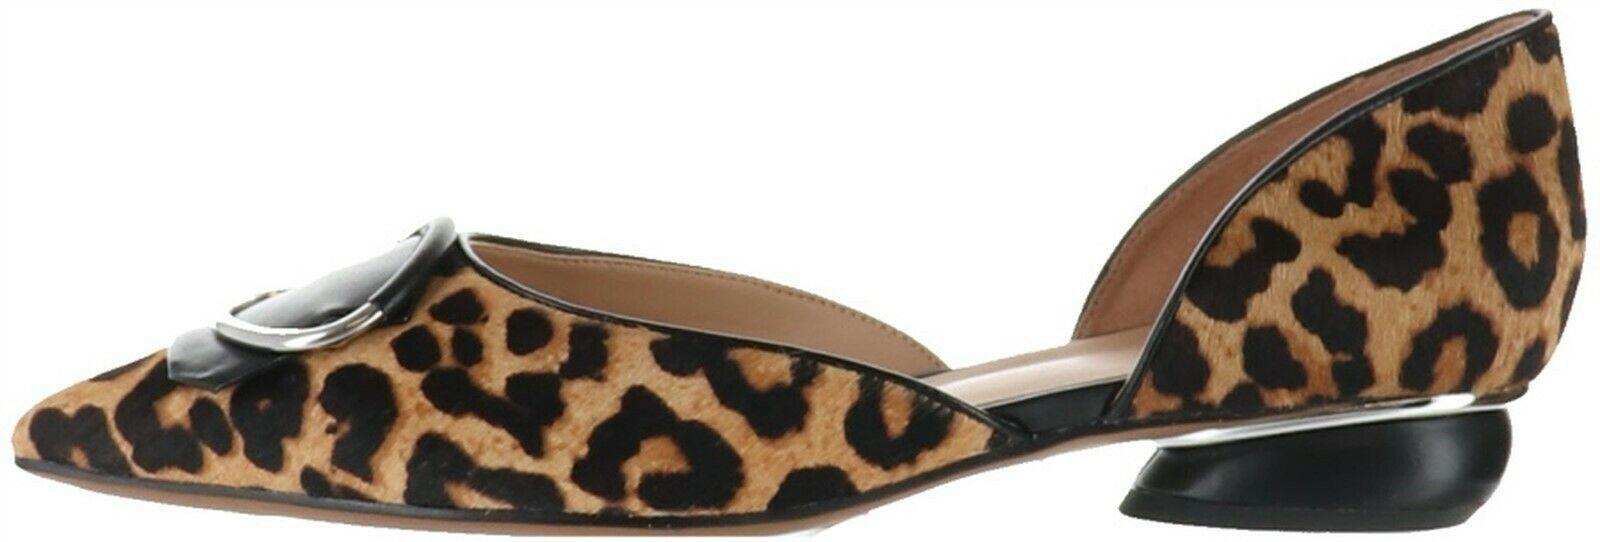 Franco Sarto Pointed Toe Haircalf Kiltie Flats Reed Camel 9M NEW A368571 - $36.61